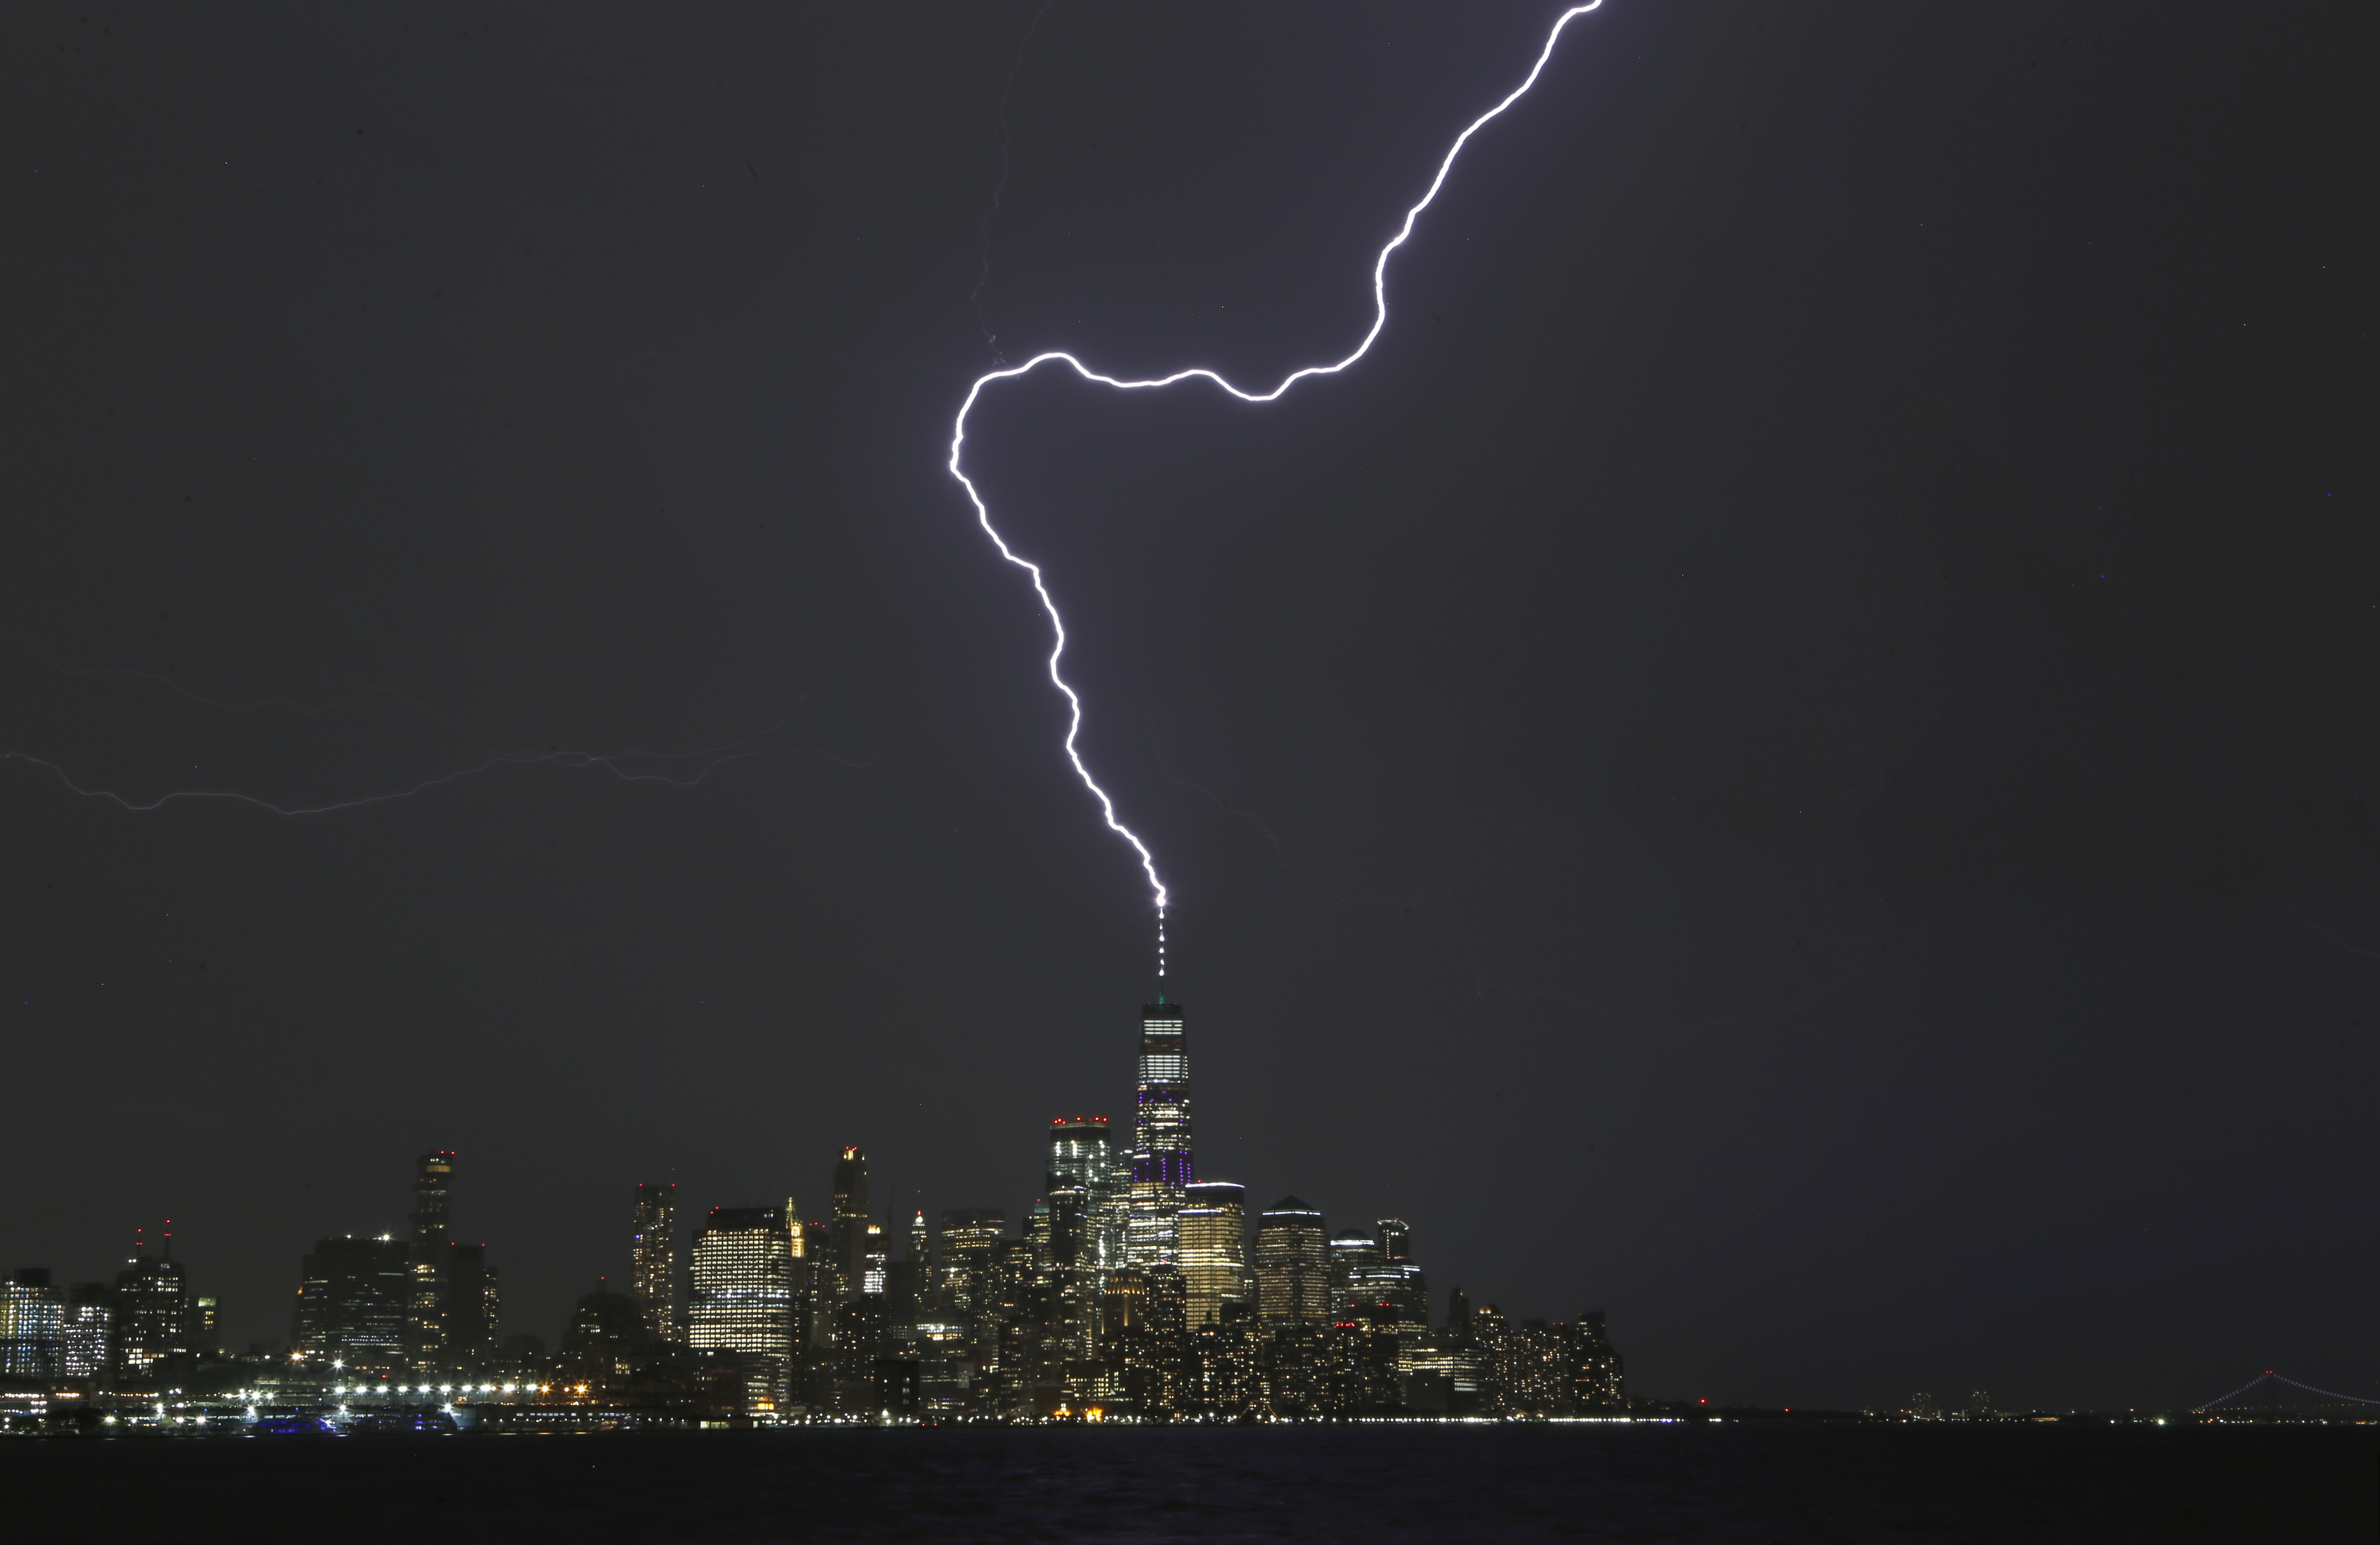 Lightning Strikes One World Trade Center in New York City